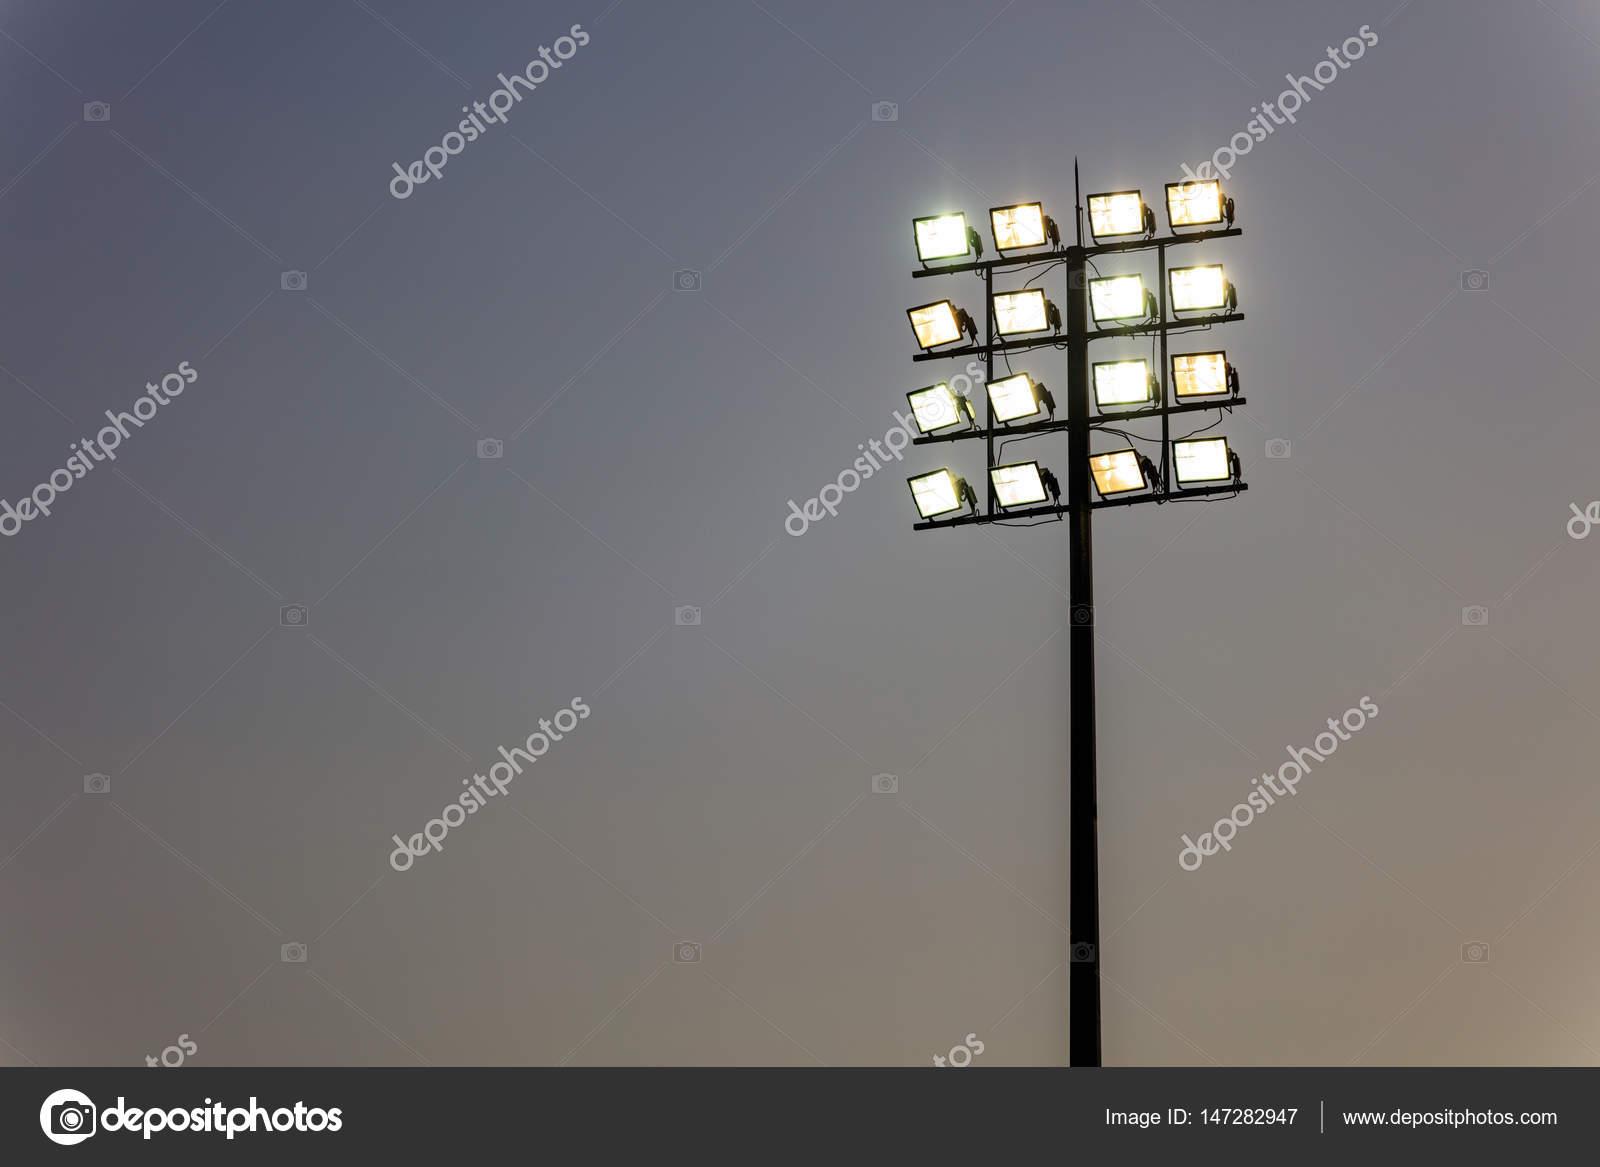 Outdoor stadium lights tower stock photo viperagp 147282947 outdoor stadium lights tower stock photo mozeypictures Choice Image